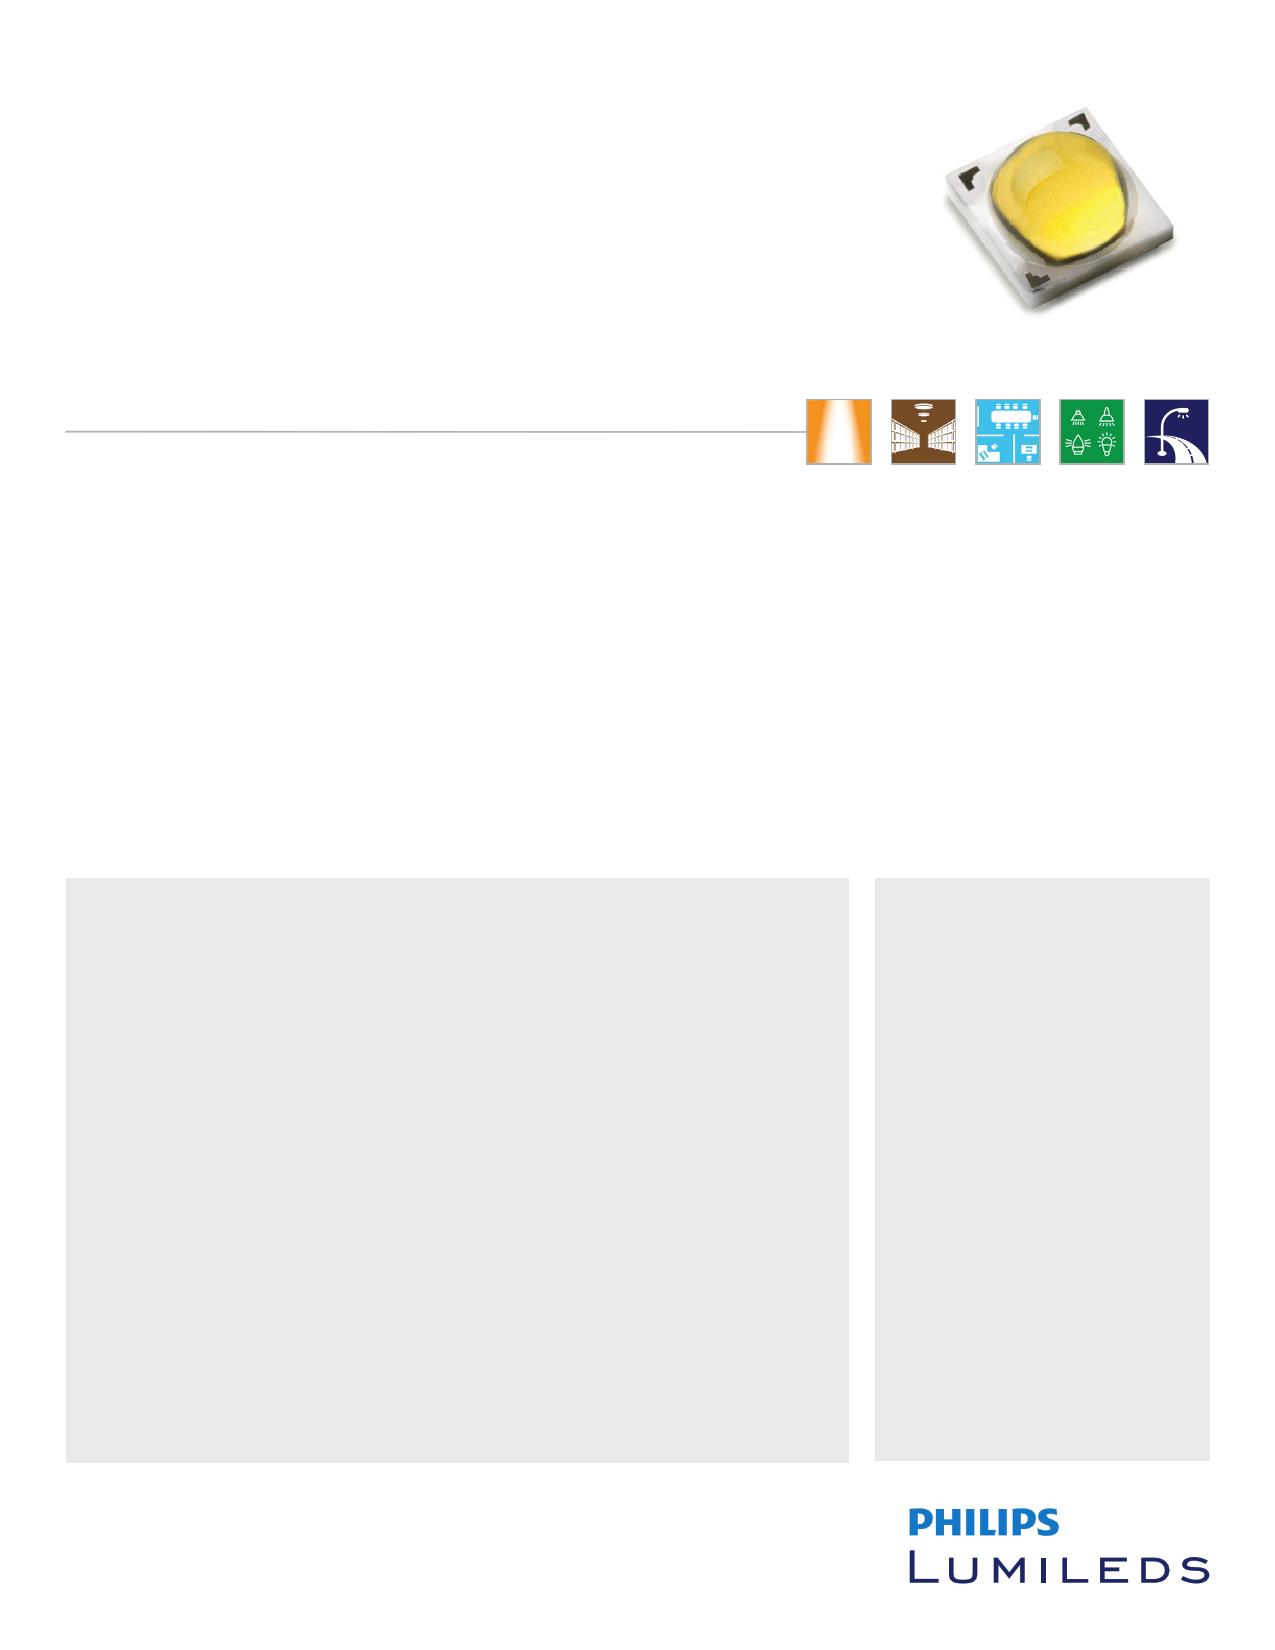 L1T2-2780000000000 datasheet